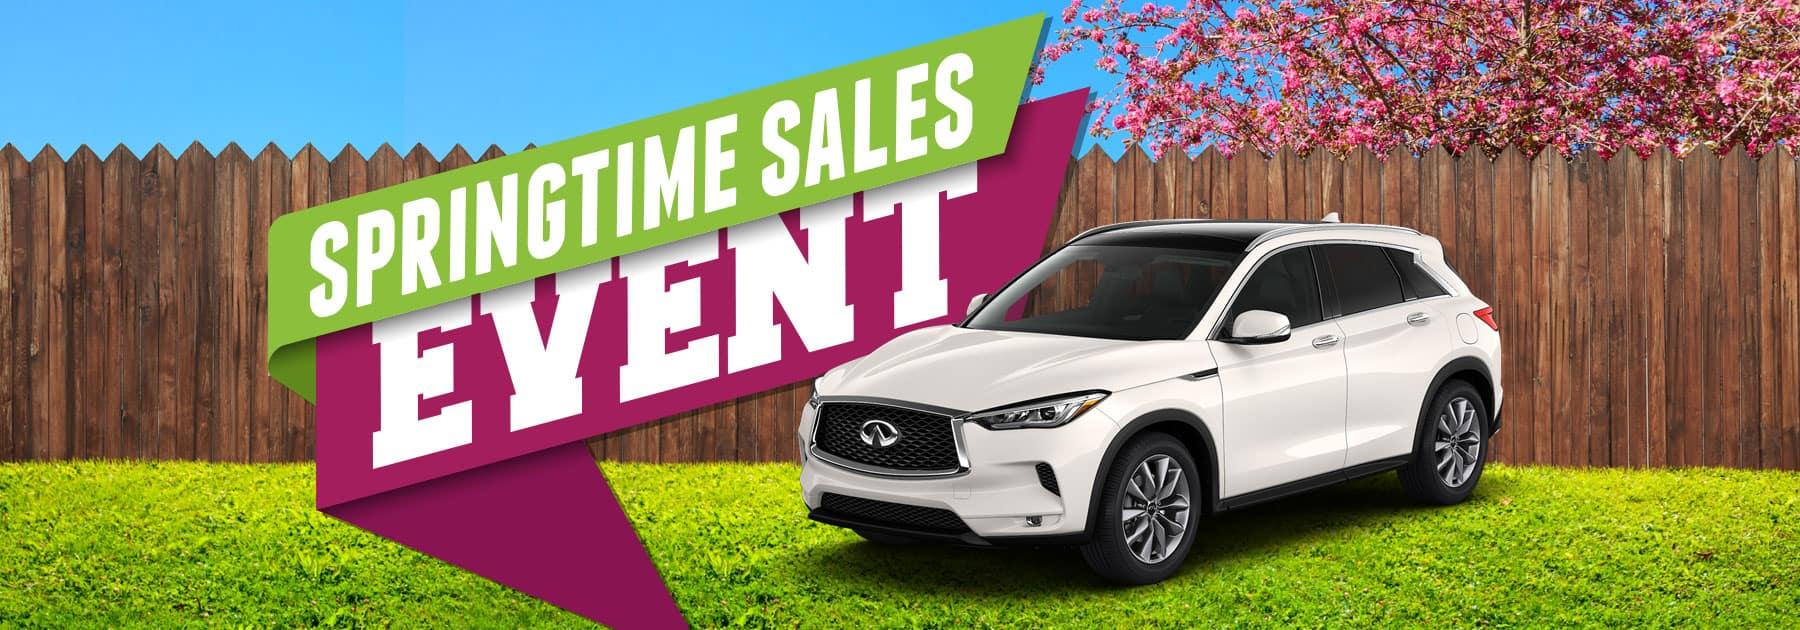 SDInf-hl-DI-springtime-sales-event-4-21-leases